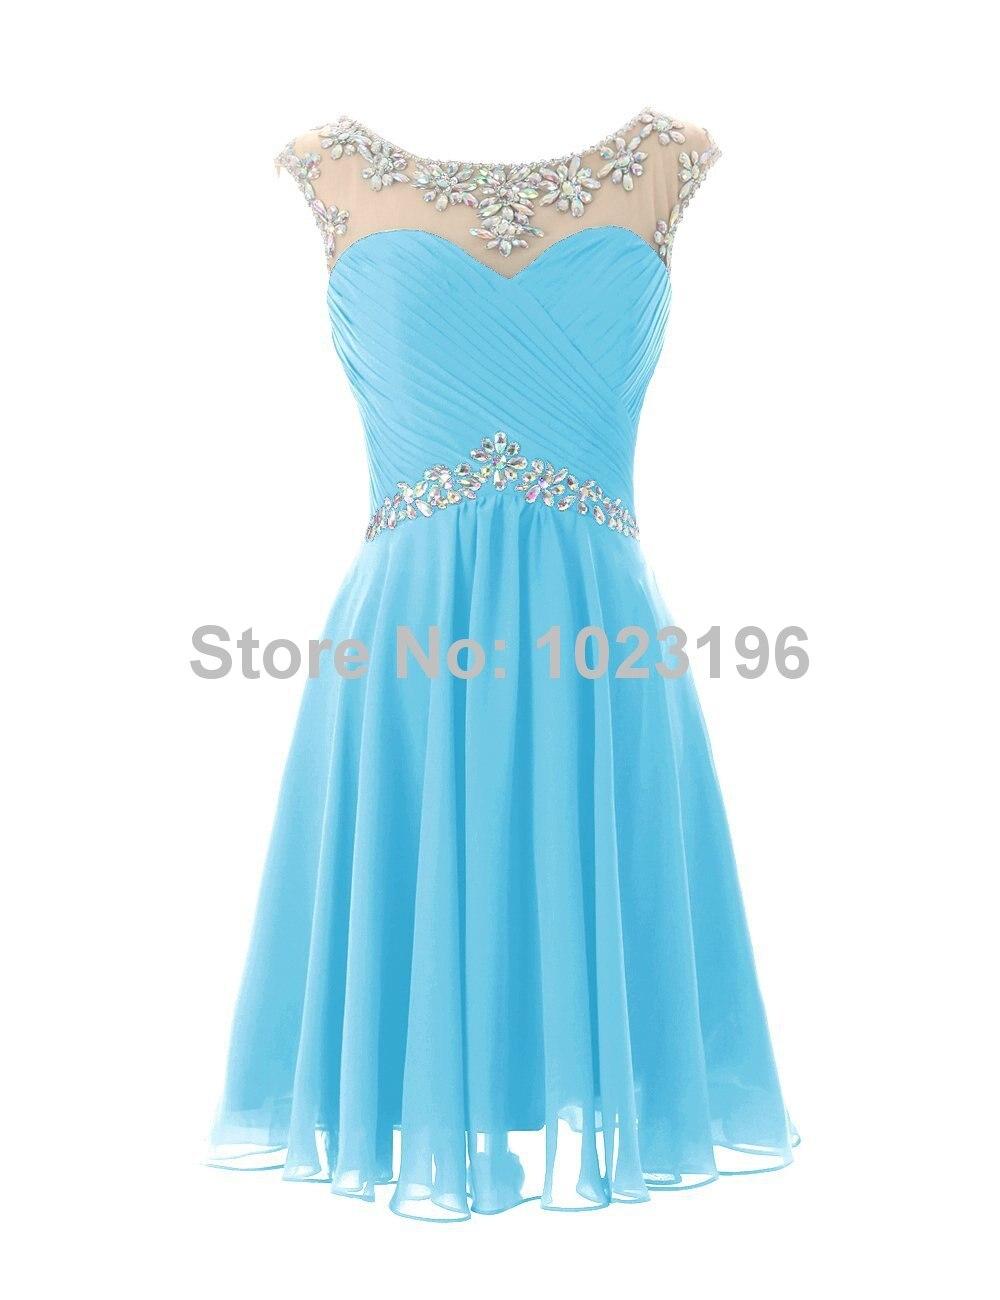 2017 Hot Sexy Short Mint Green Royal Crystal Chiffon Prom Dress ...